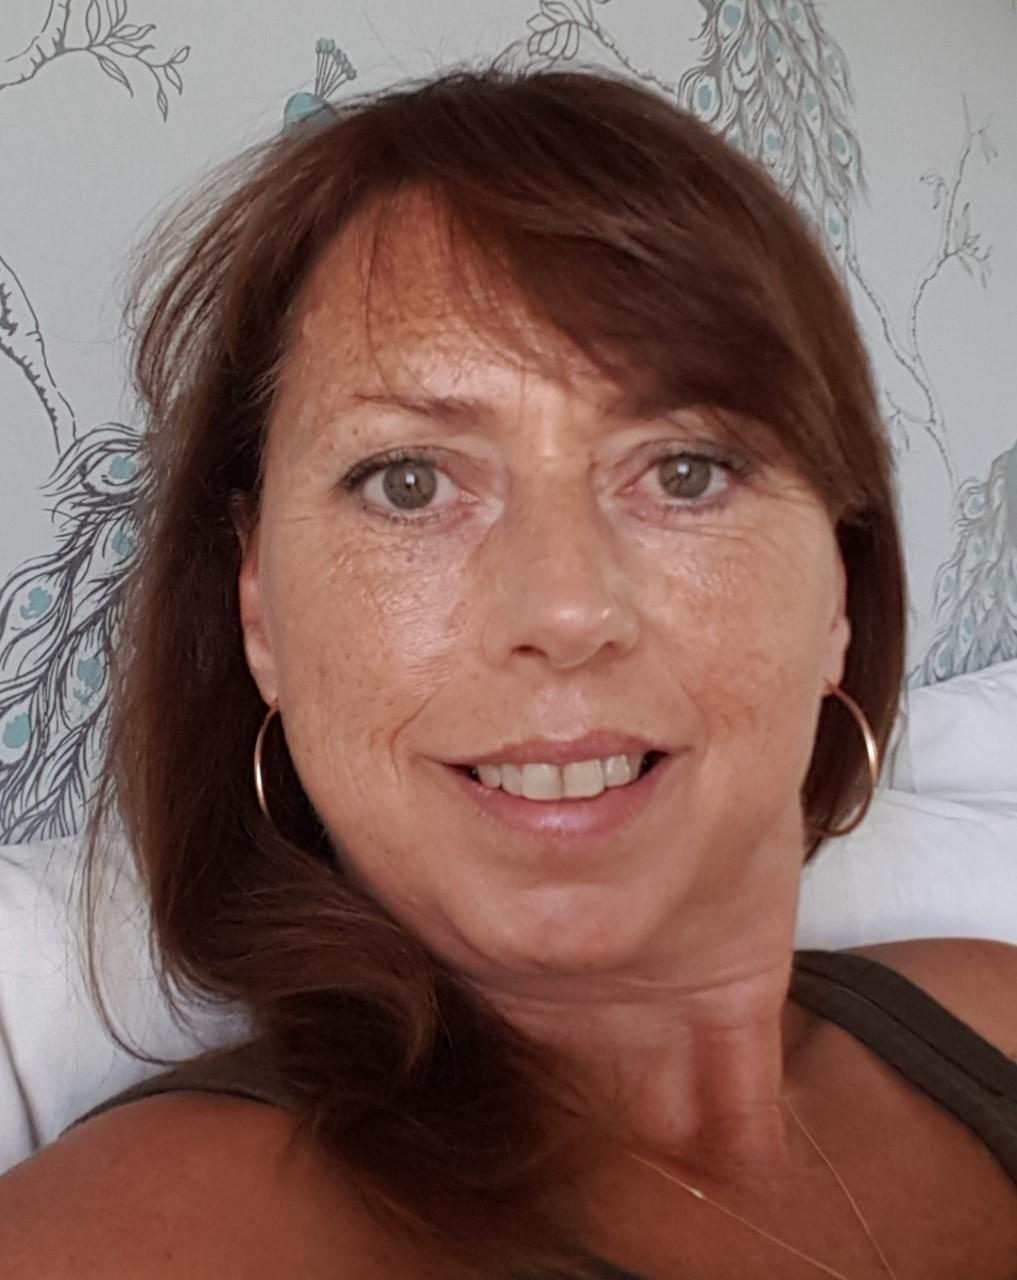 Lorraine Baines